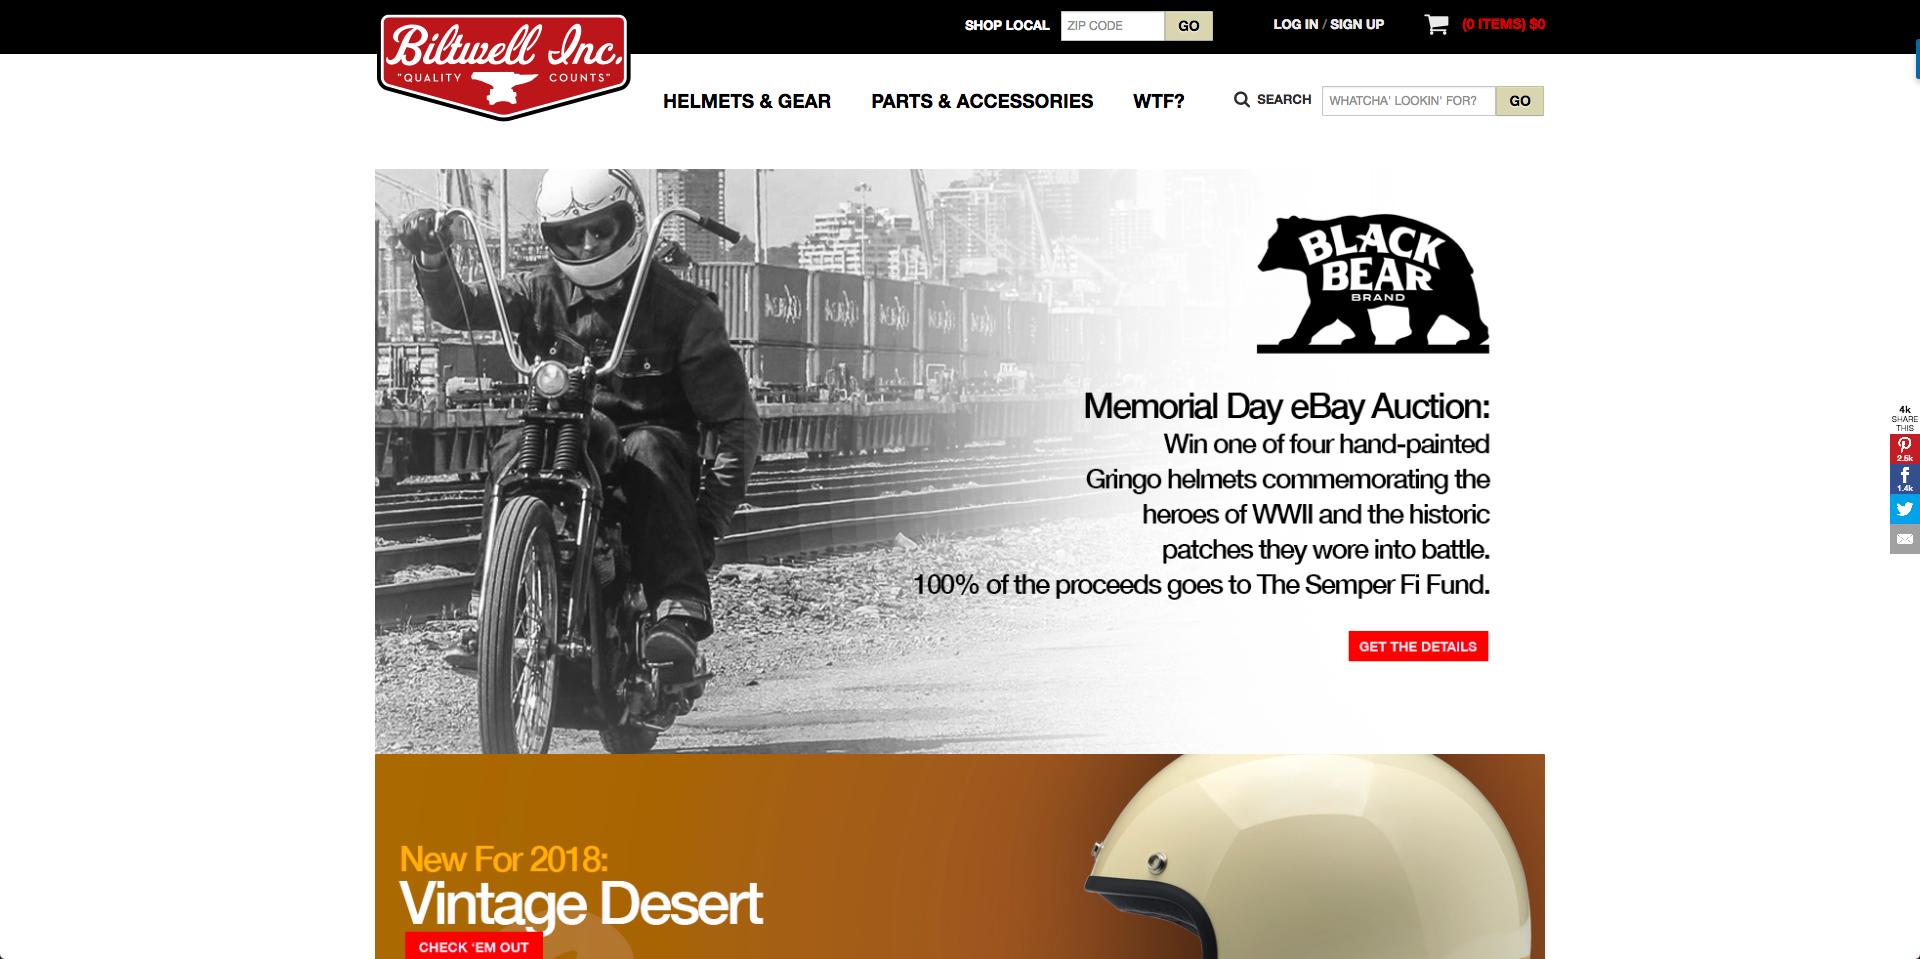 Media Marketing  Marketing material for Black Bear Brand